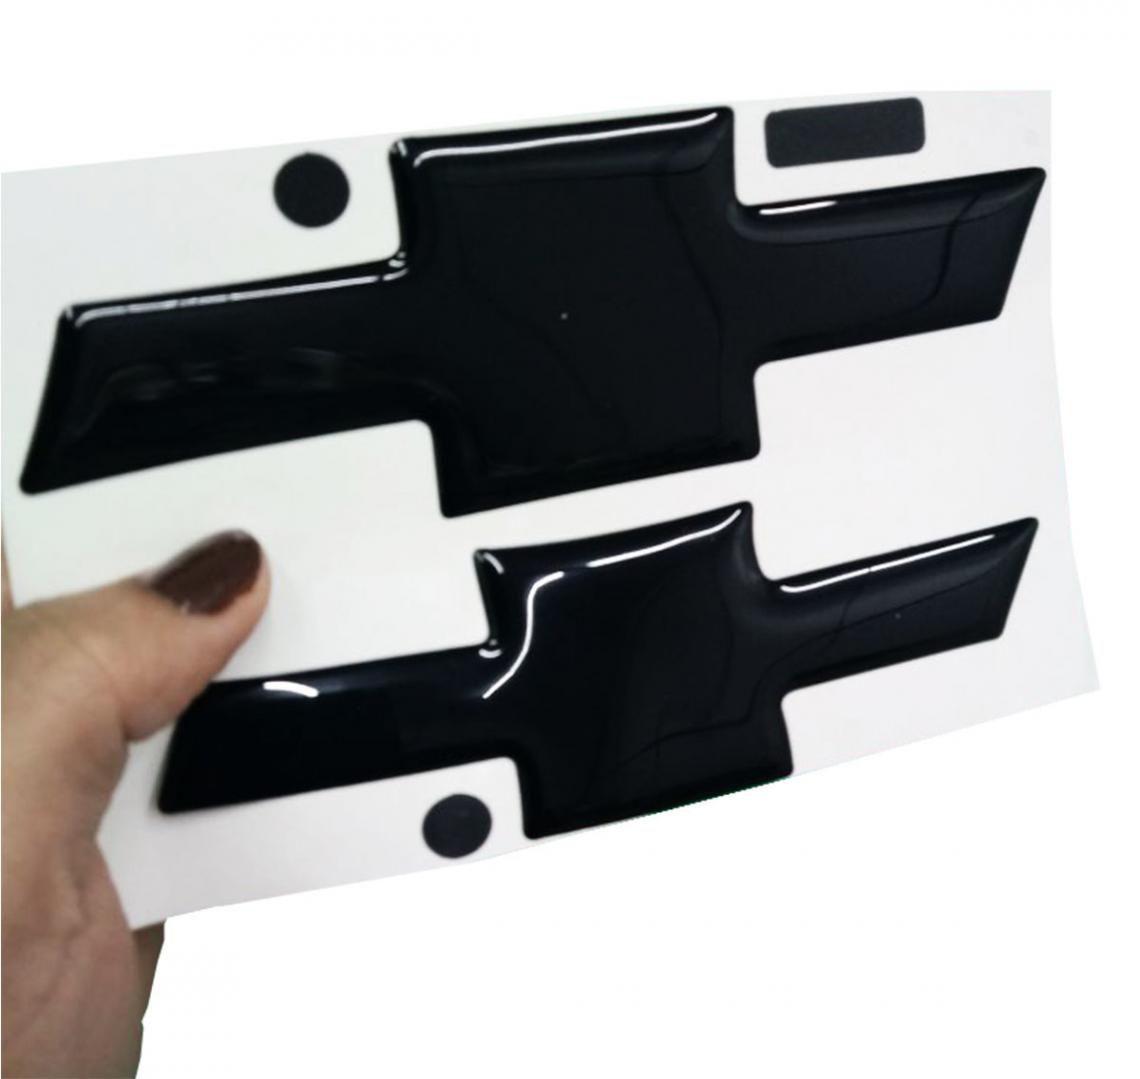 Gravata Adesiva Resinada S10 2012 até 2017 Black Piano